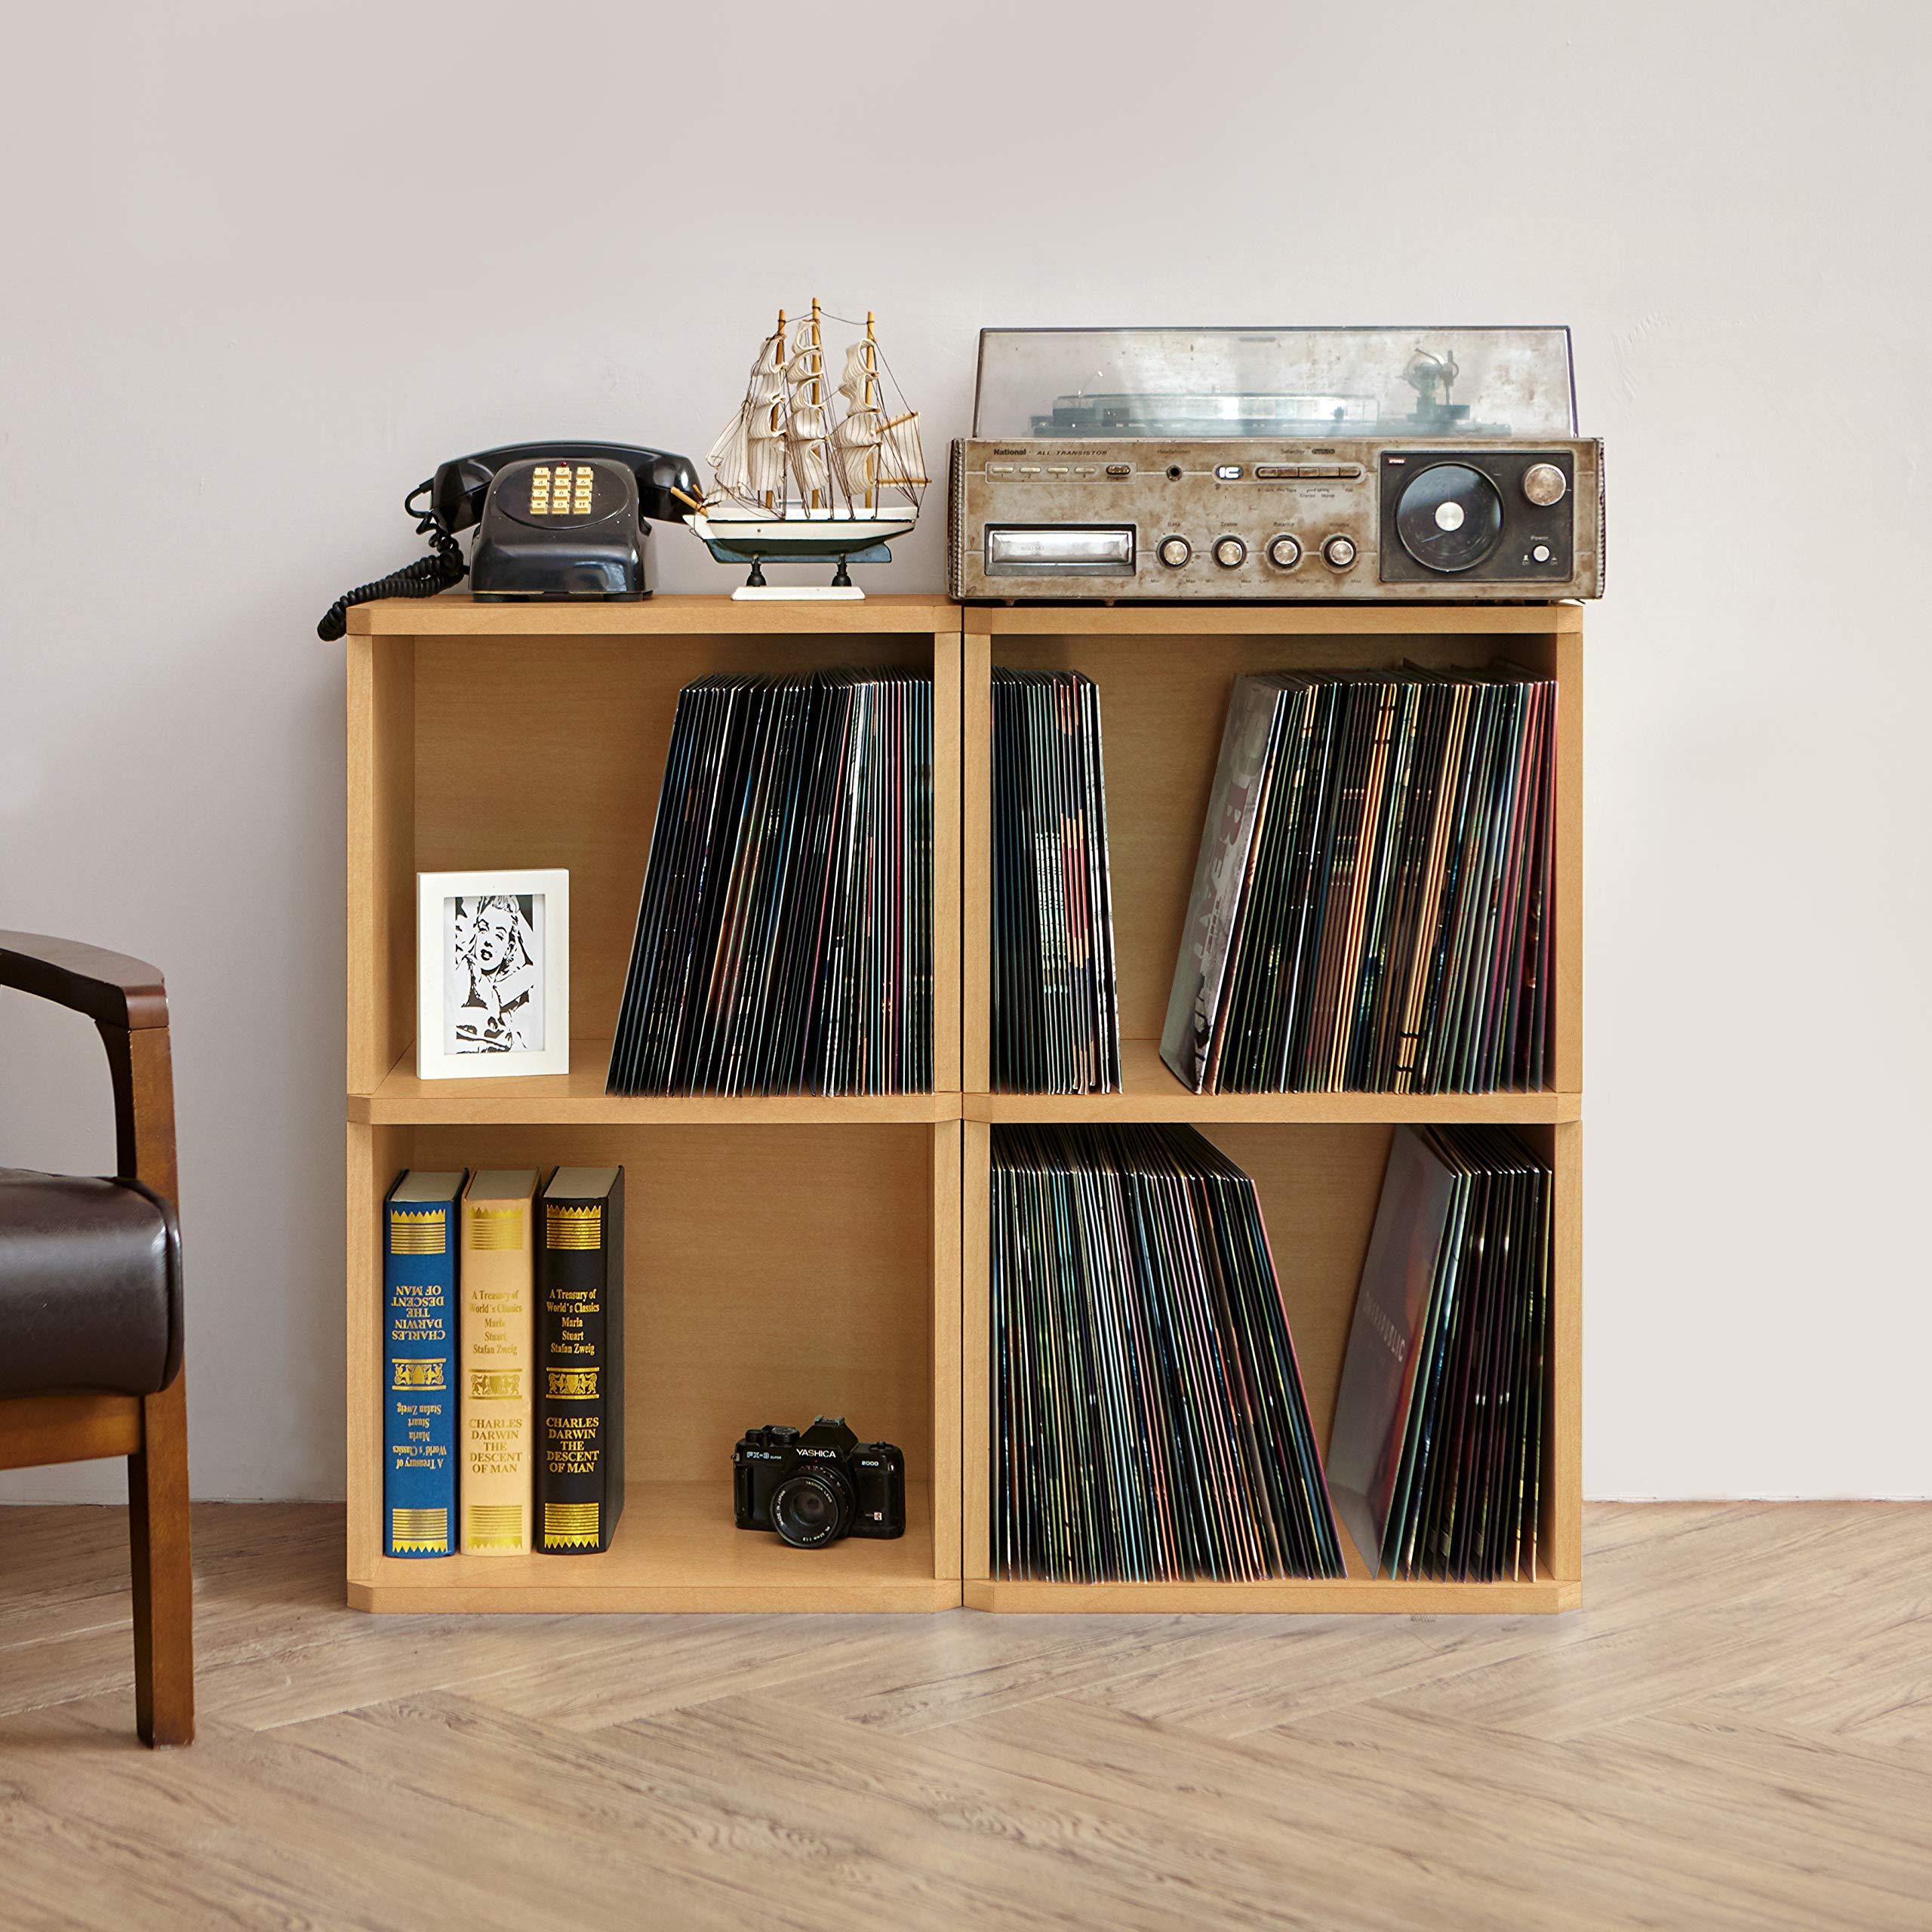 Music Latest Collection Of Eco 2-shelf Vinyl Lp Record Album Storage Cube Black Lifetime Guarantee